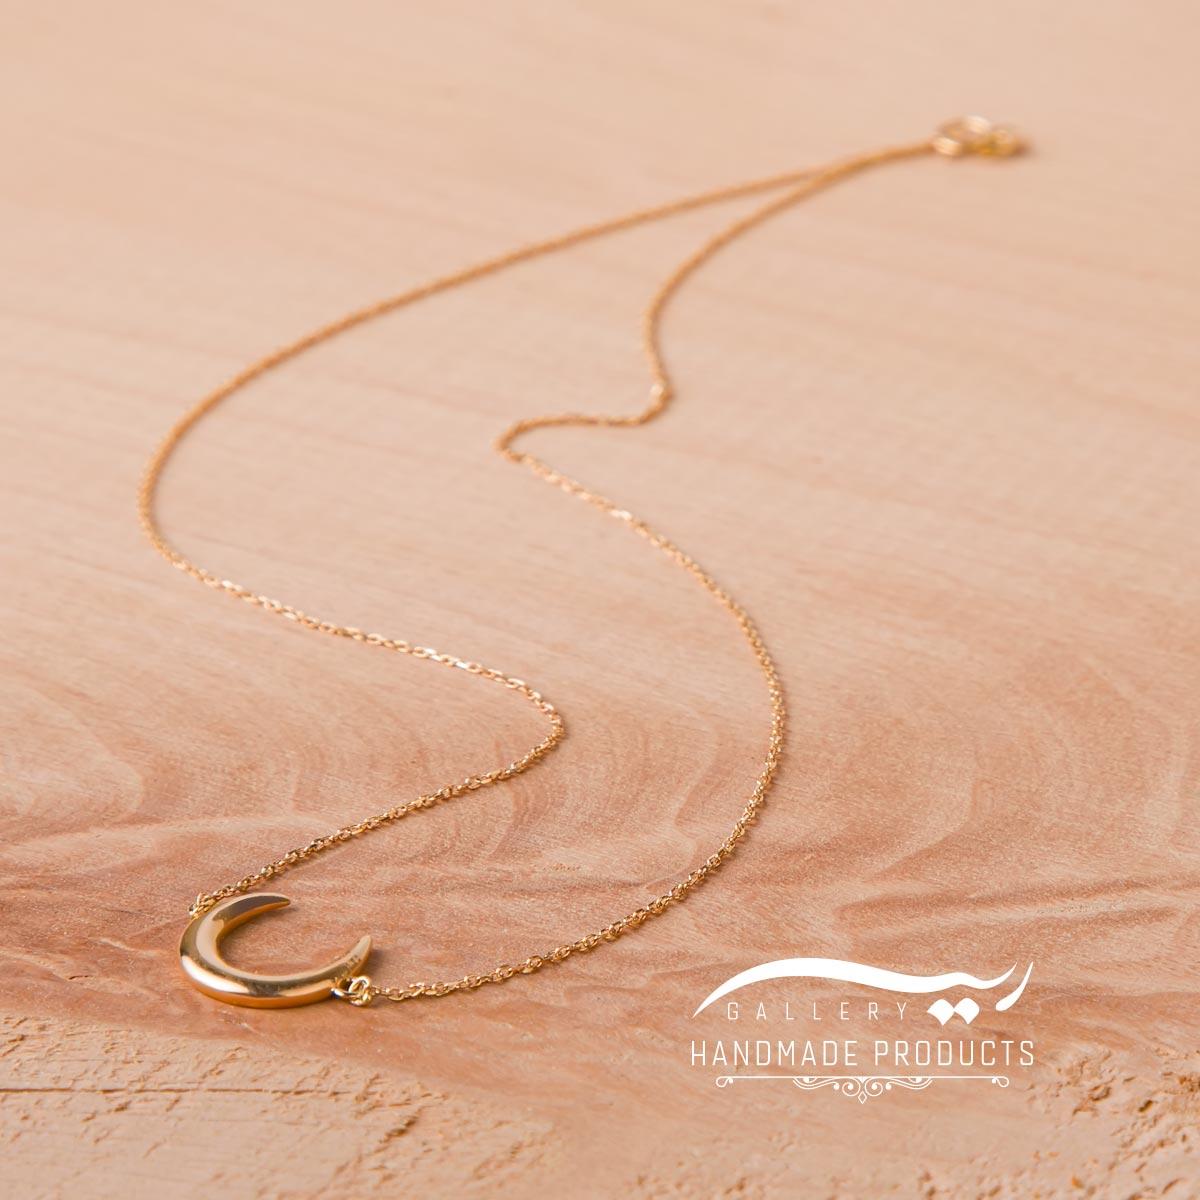 جدیدترین عکس گردنبند طلا زنانه لونا